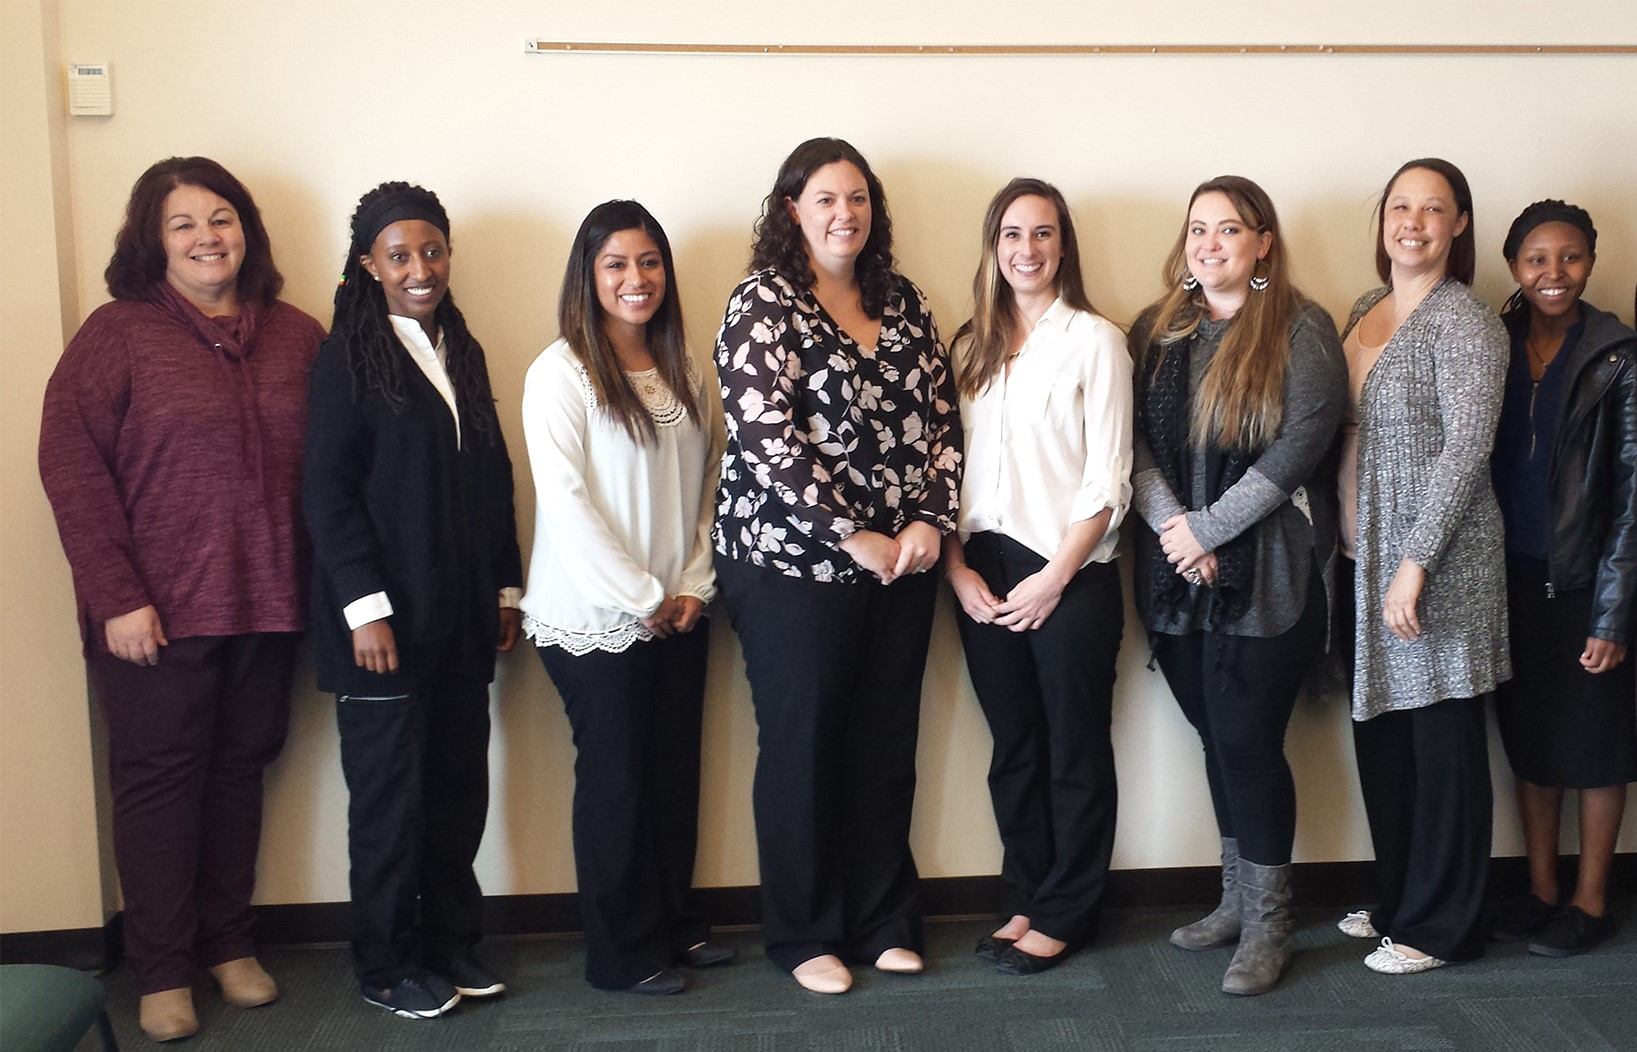 Members of the first graduating cohort from Regis University's dual enrollment nursing program (Photo by Regis University)